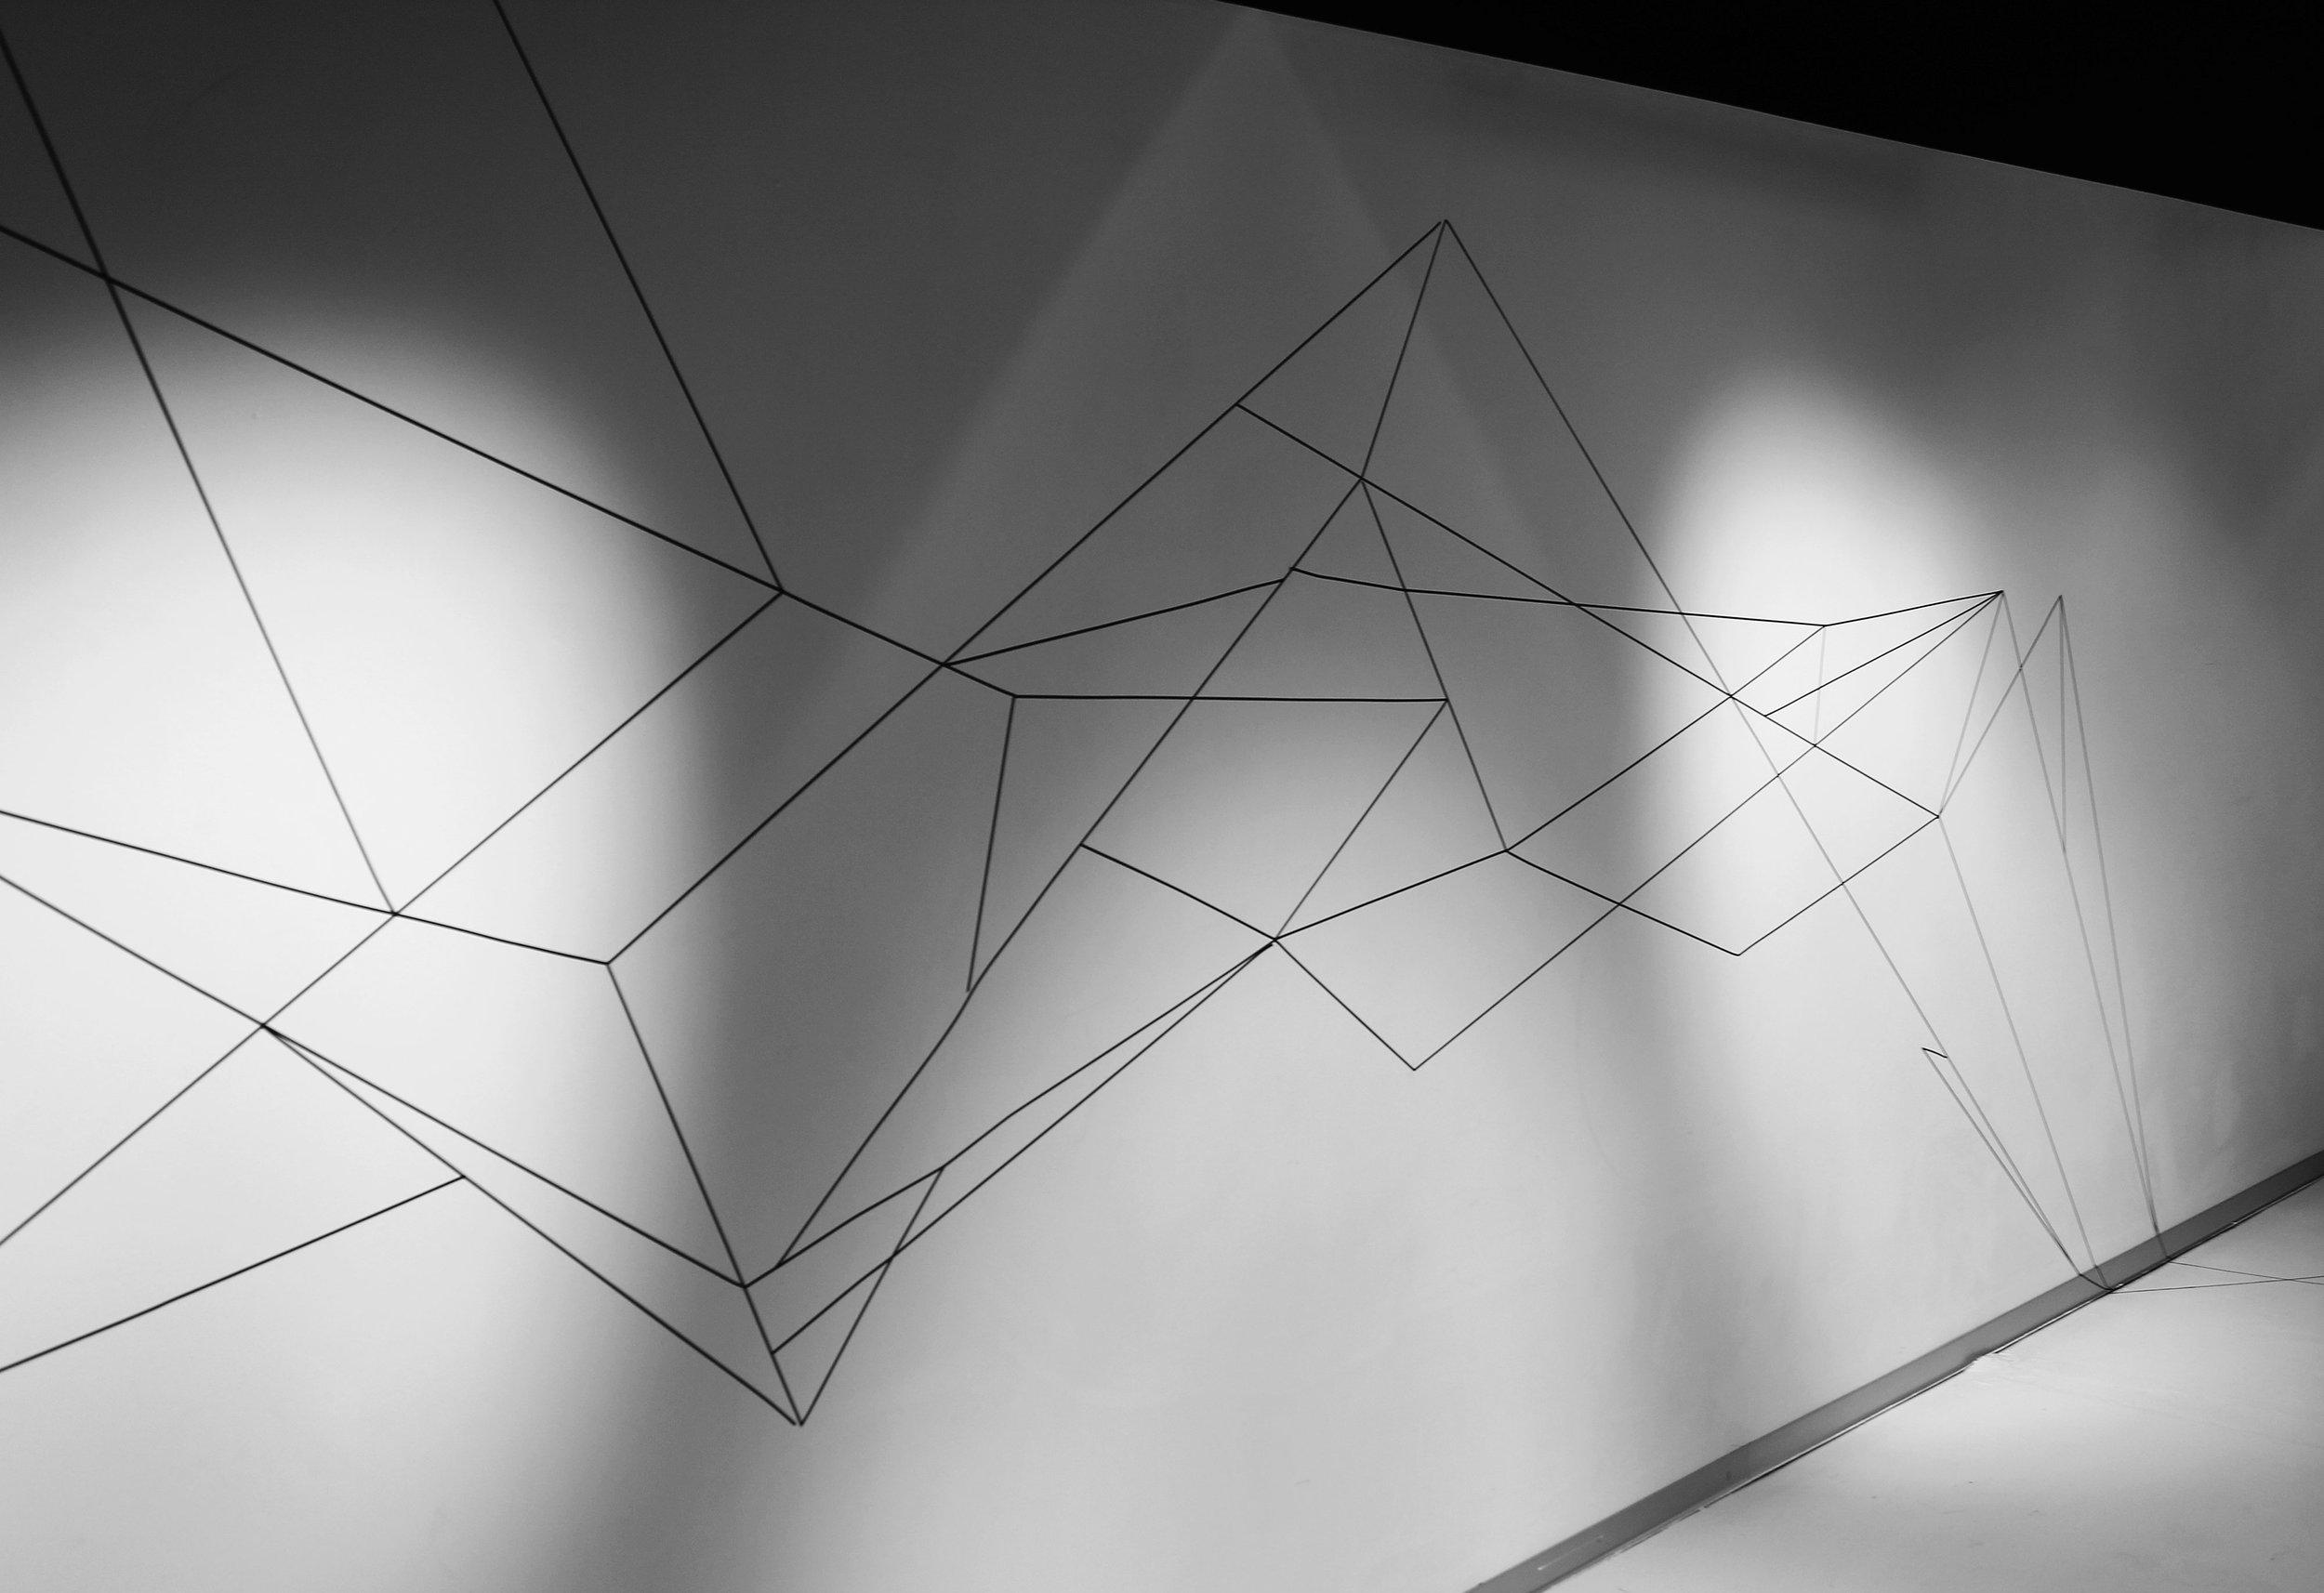 makebardo_graffiti_tapes_lines_05.jpg